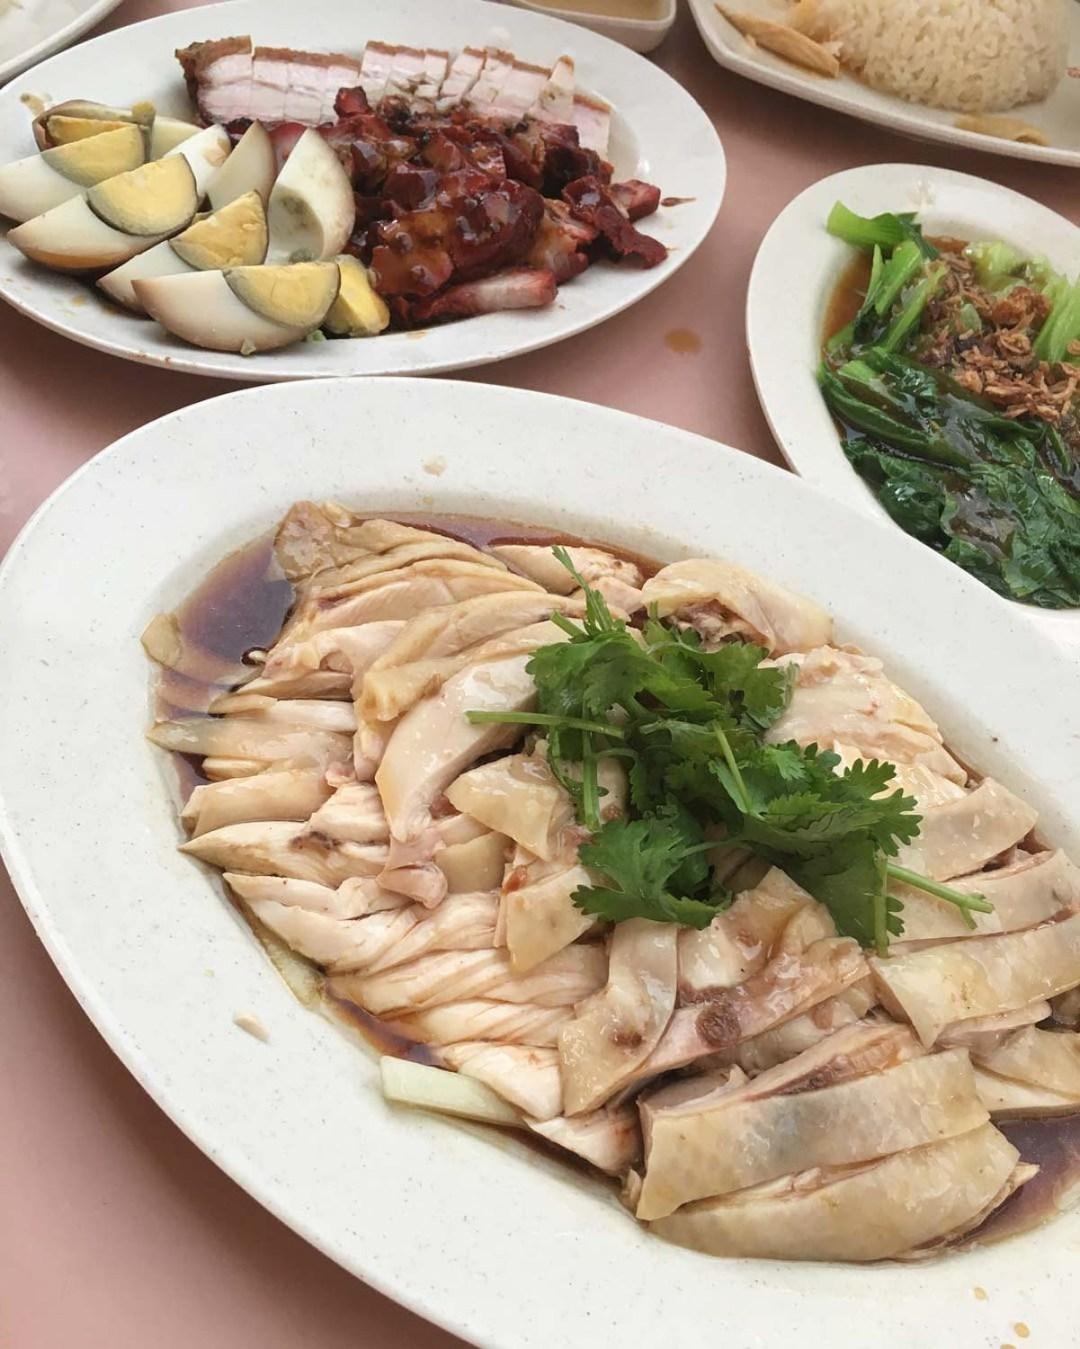 Kebun Baru Food Centre - Chye Ji Hainanese Chicken Rice